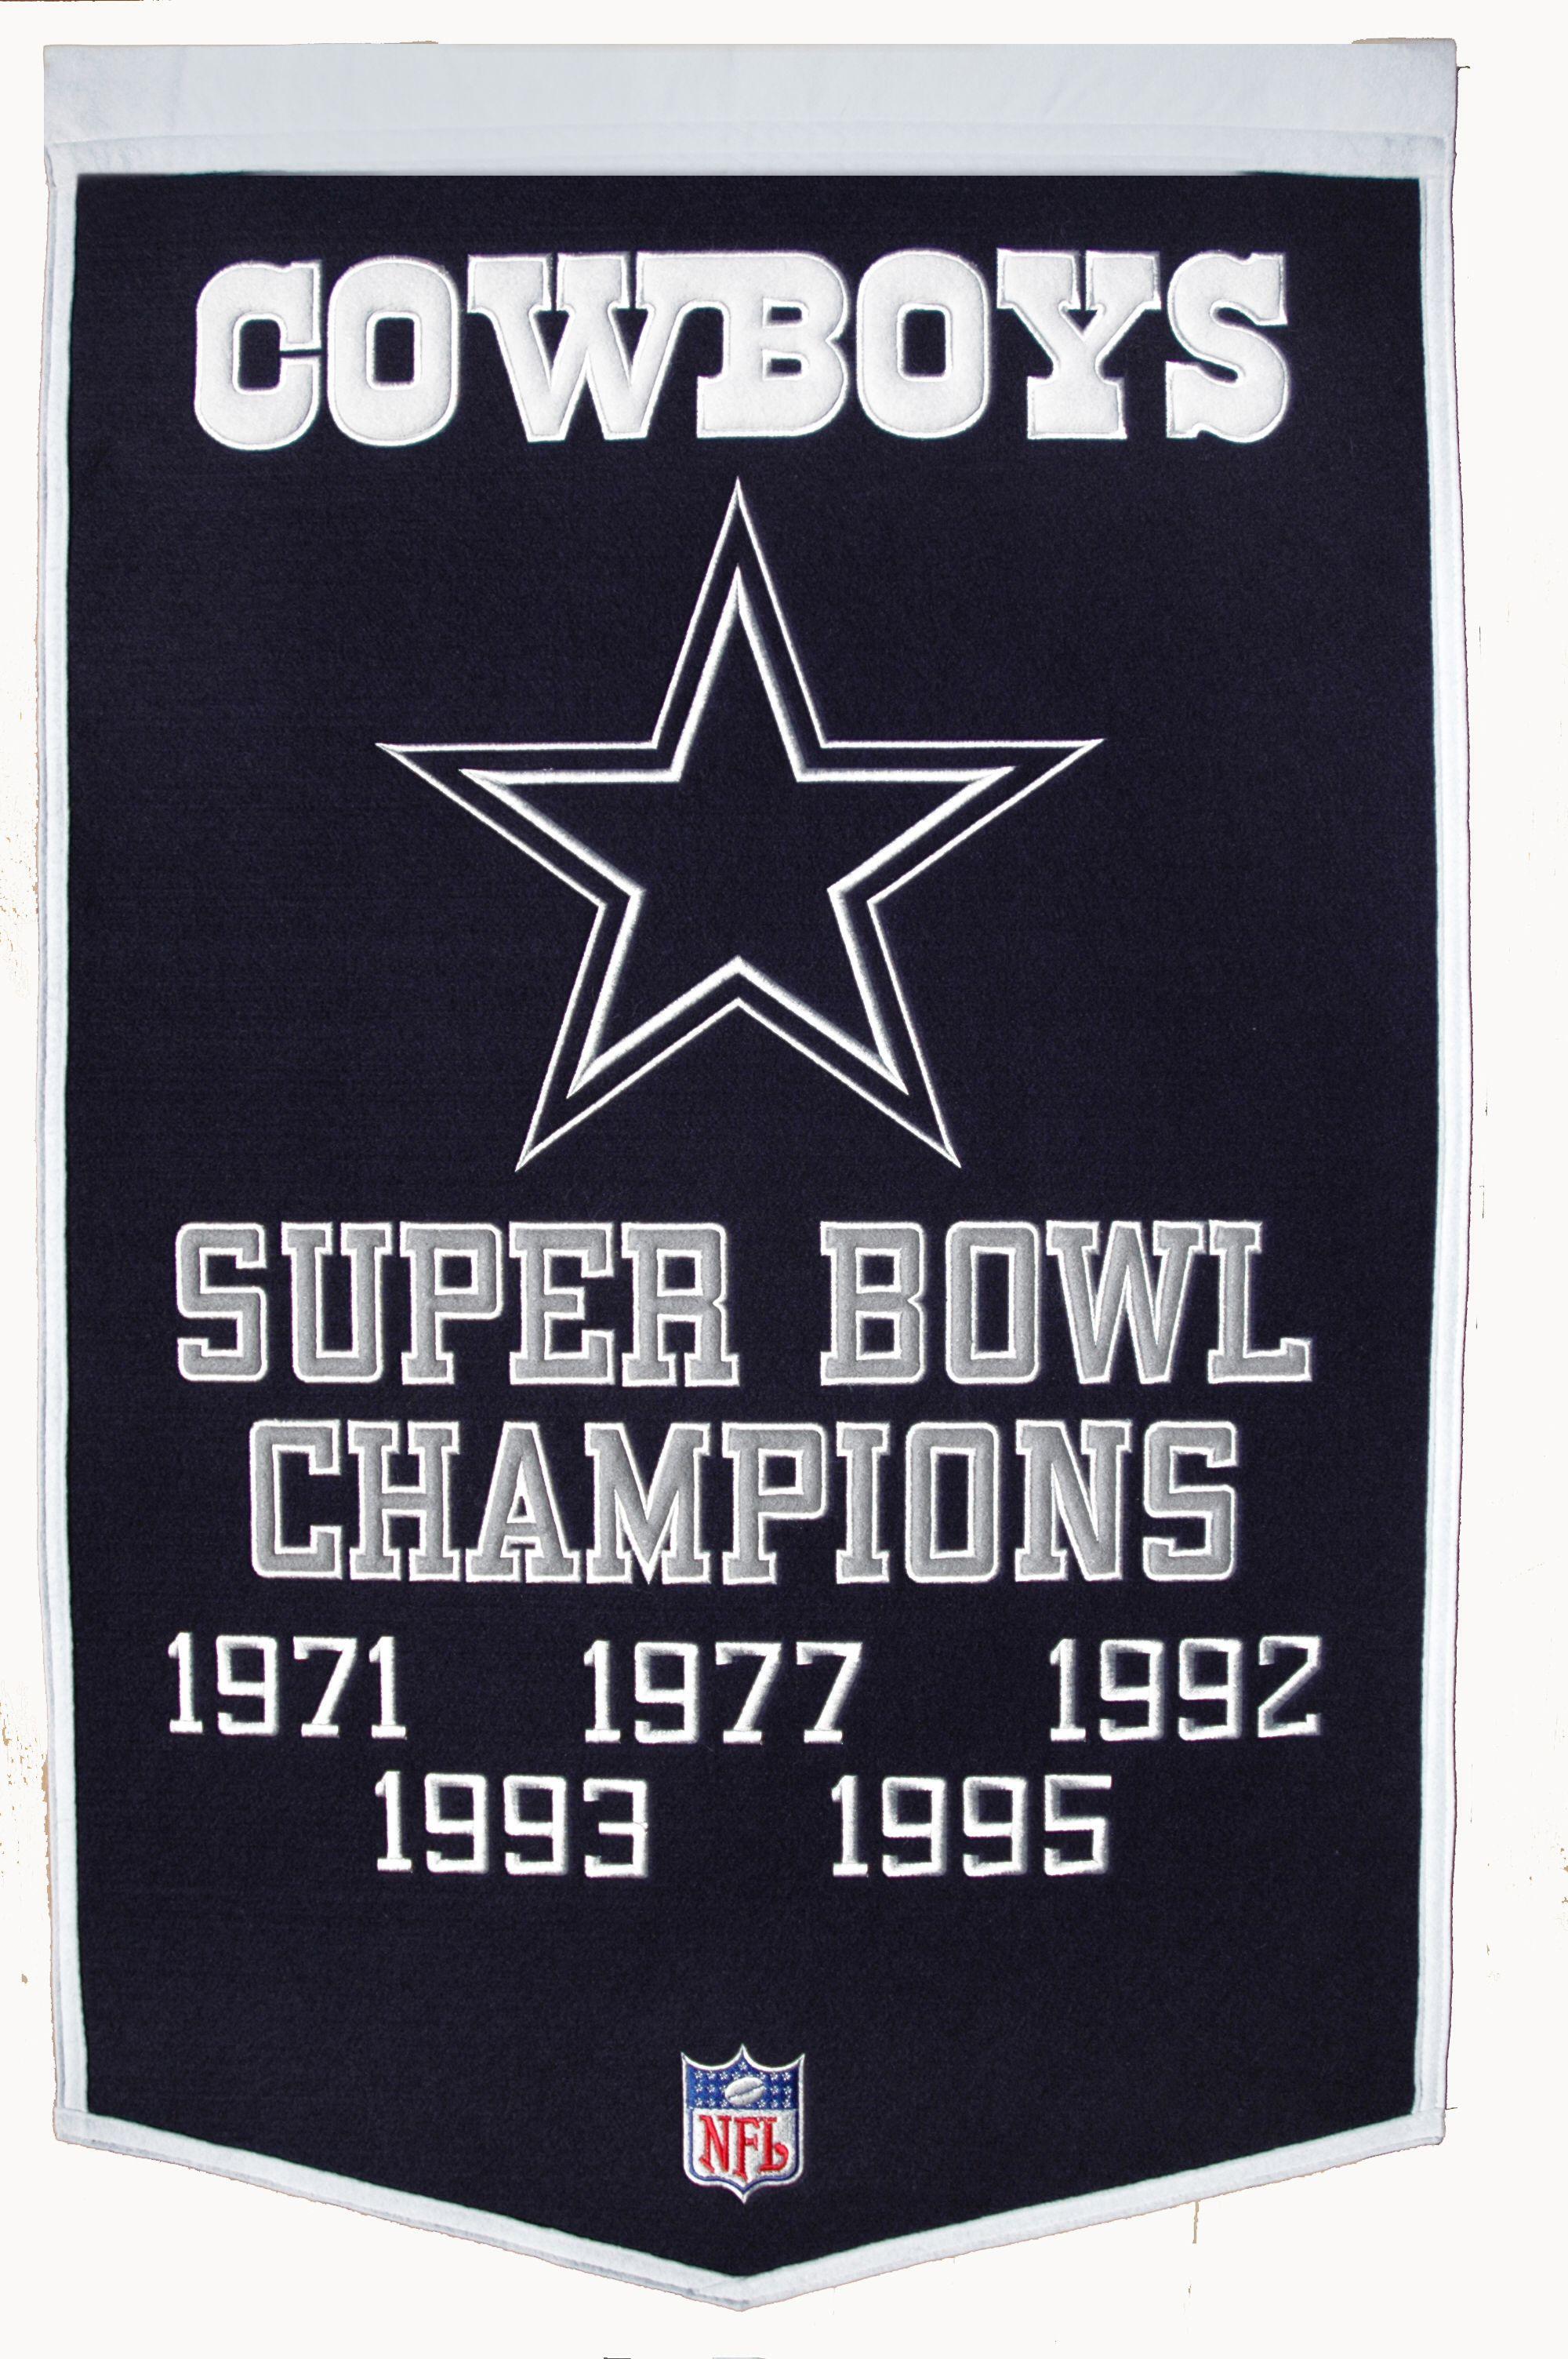 Dallas Cowboys. 5X Super Bowl Champs. Love my team  d1063c3f9